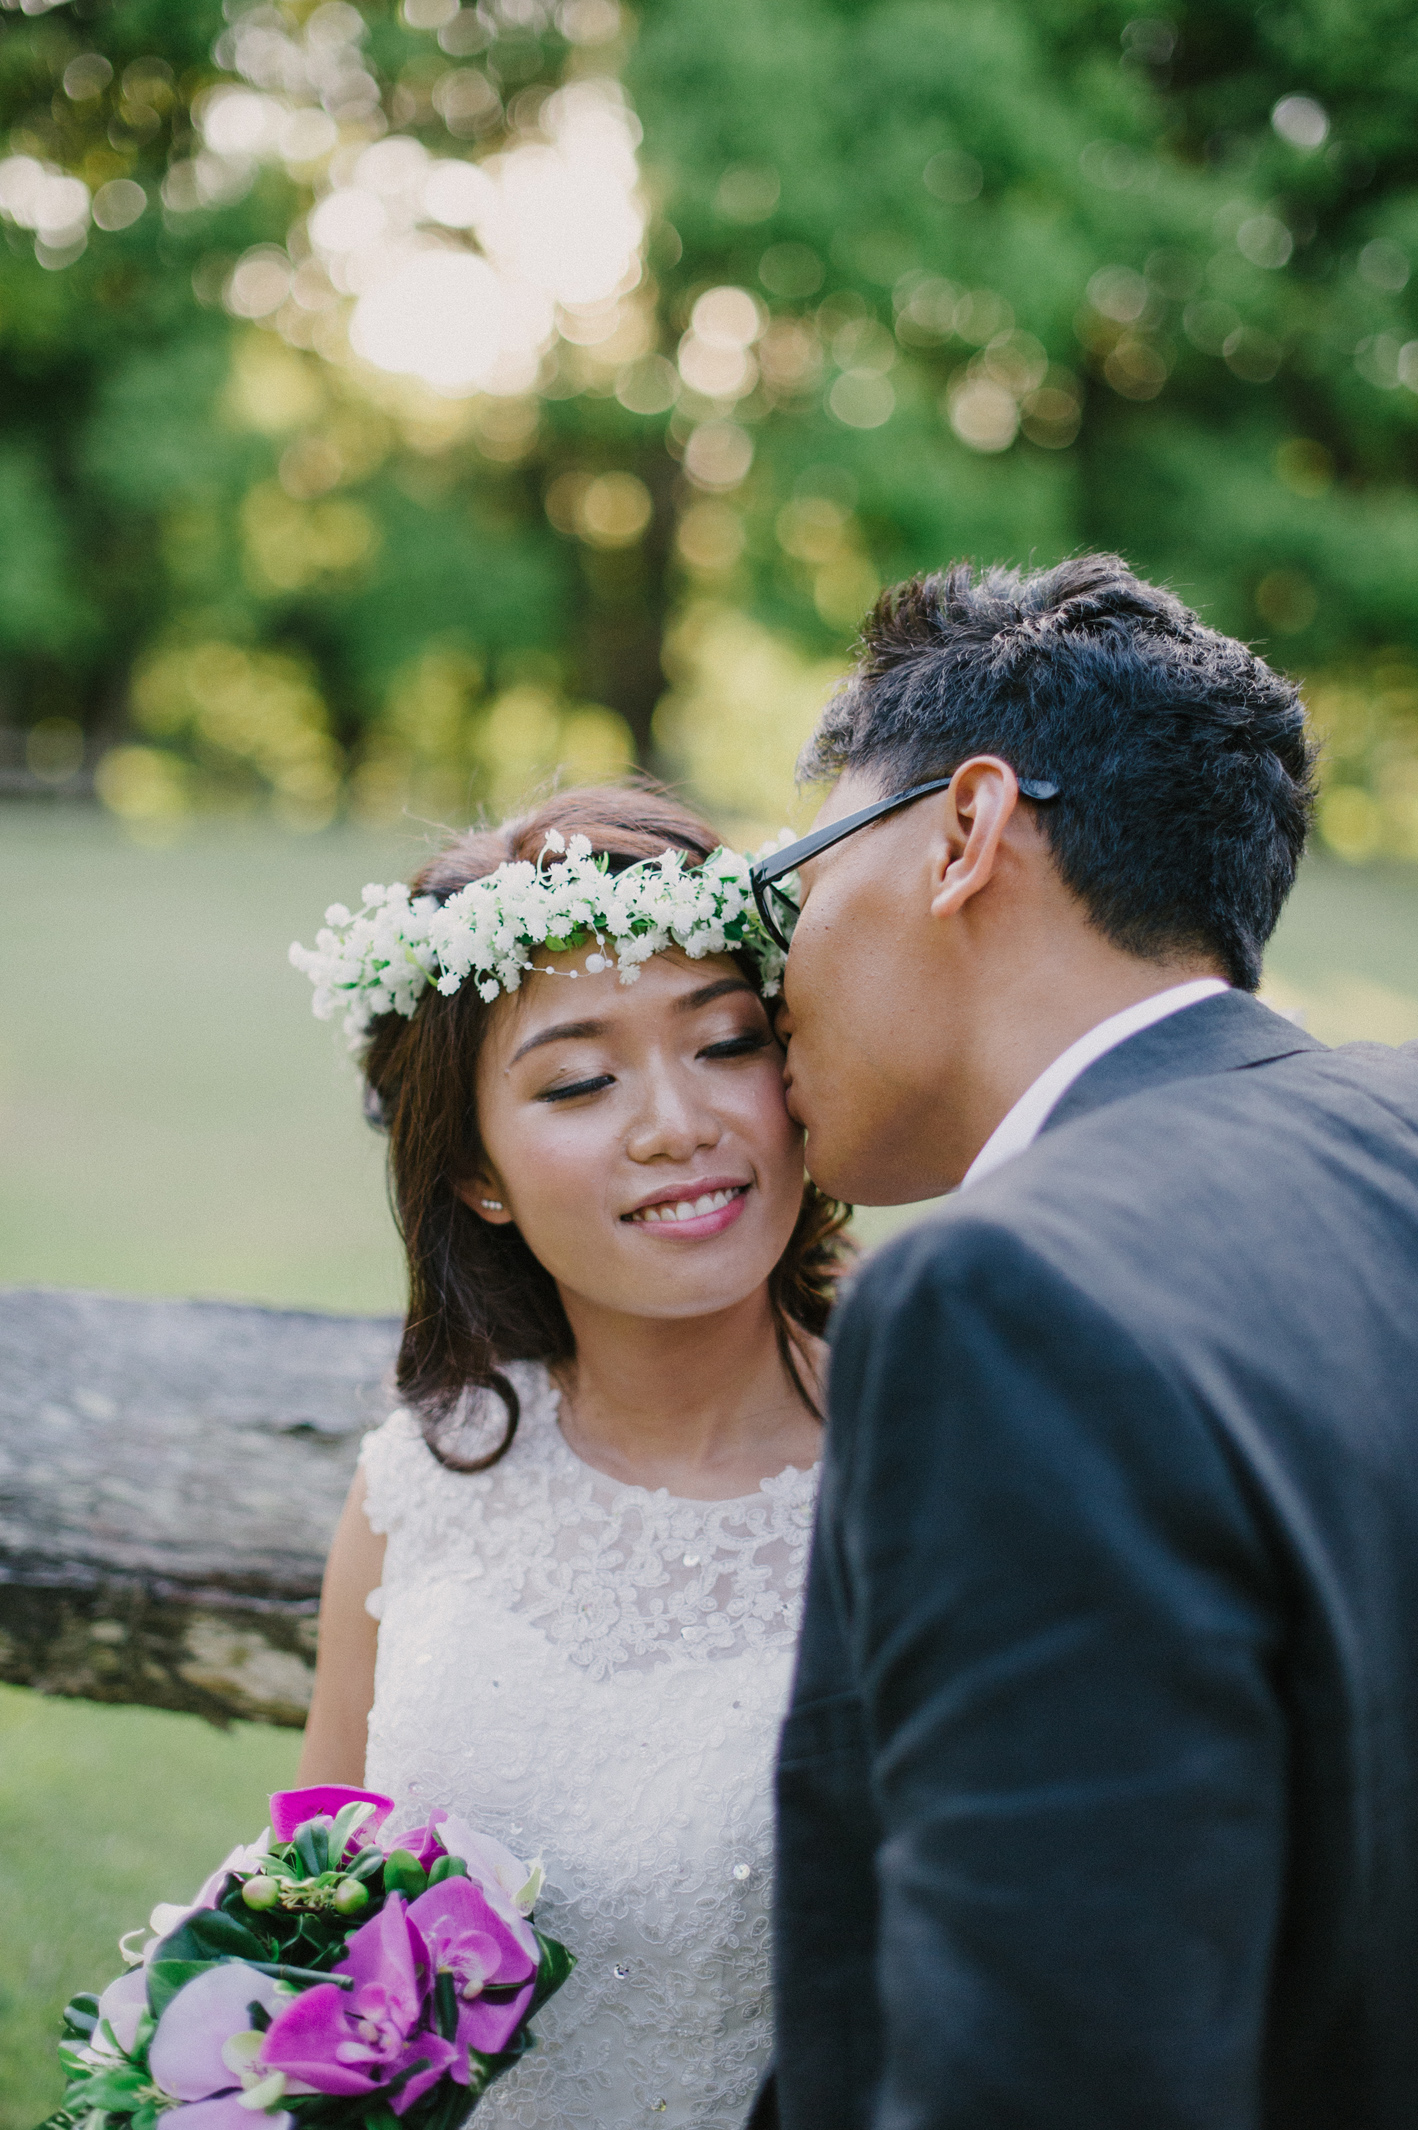 008-ed-janet-currumbin-wedding_sophie-baker-photography